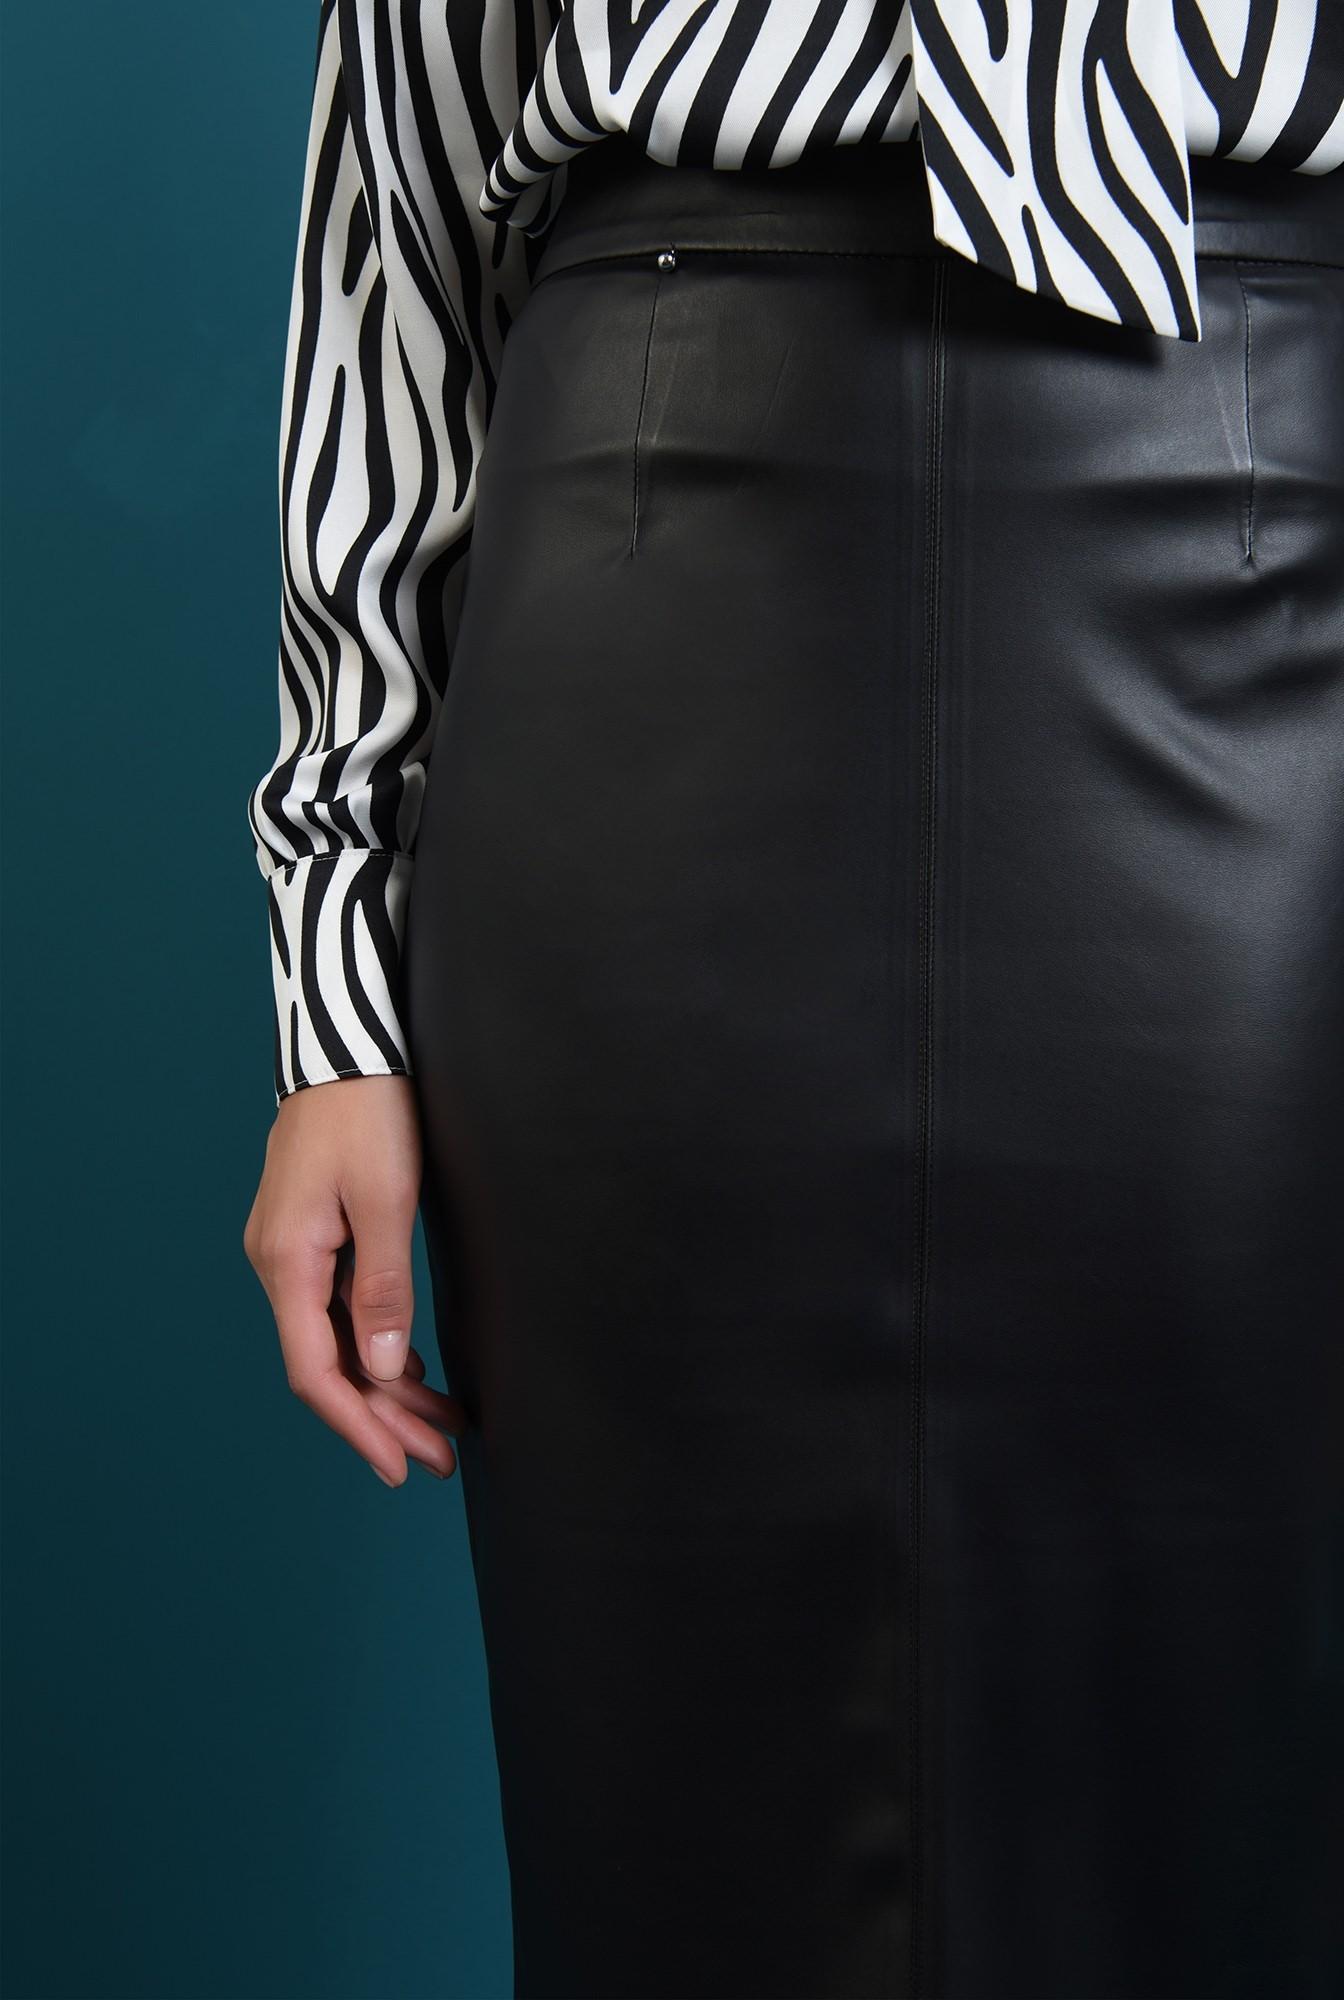 1 - fusta casula, neagra, cu talie inalta